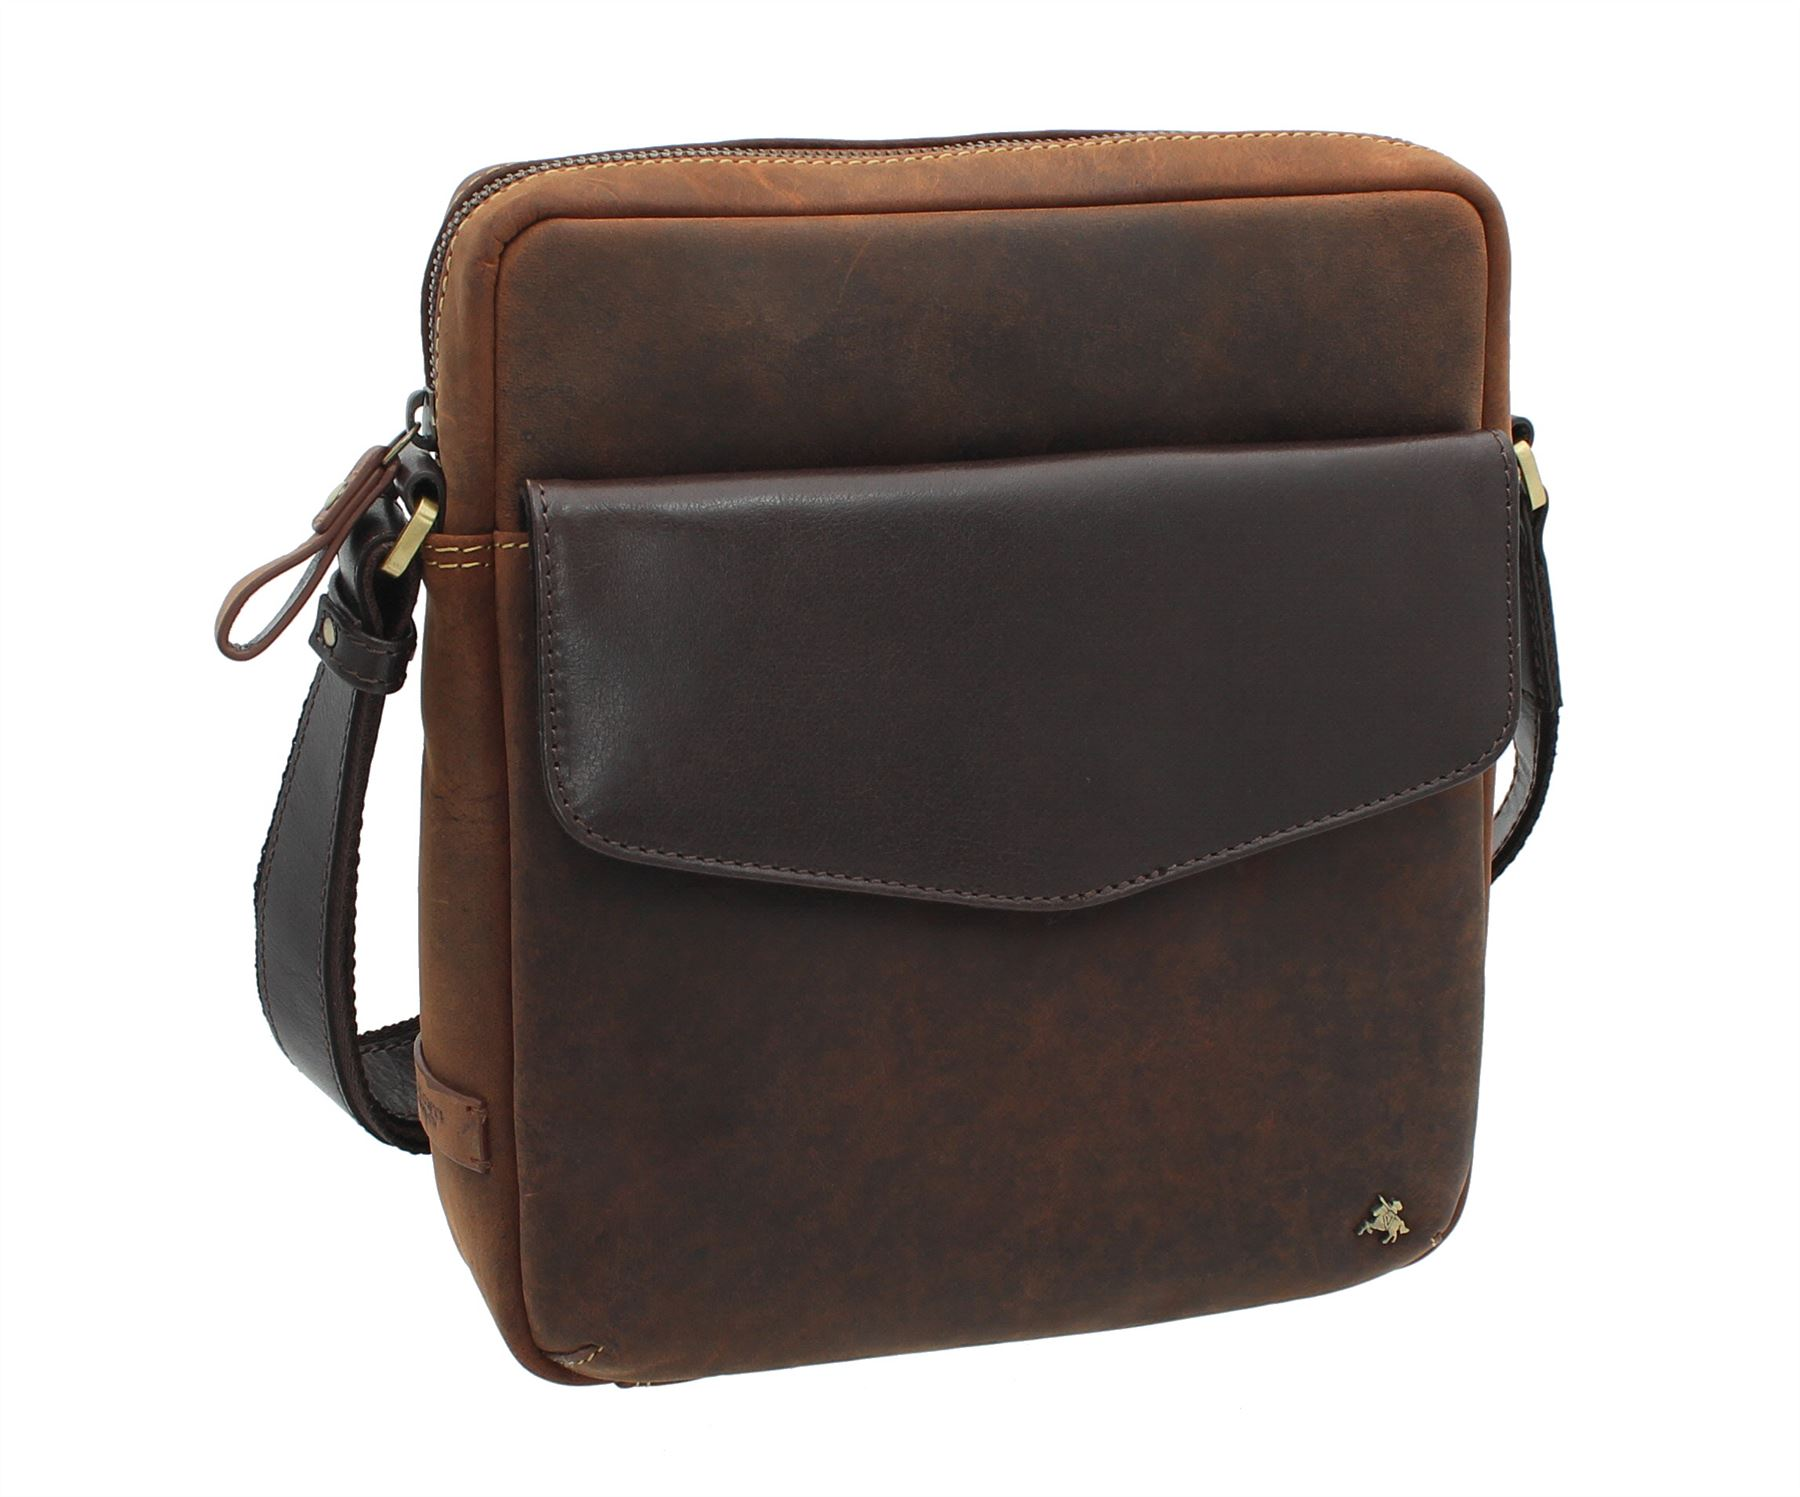 Visconti Toscana Collection Distressed Oiled Leather Shoulder Bag Vesper A5 TC70